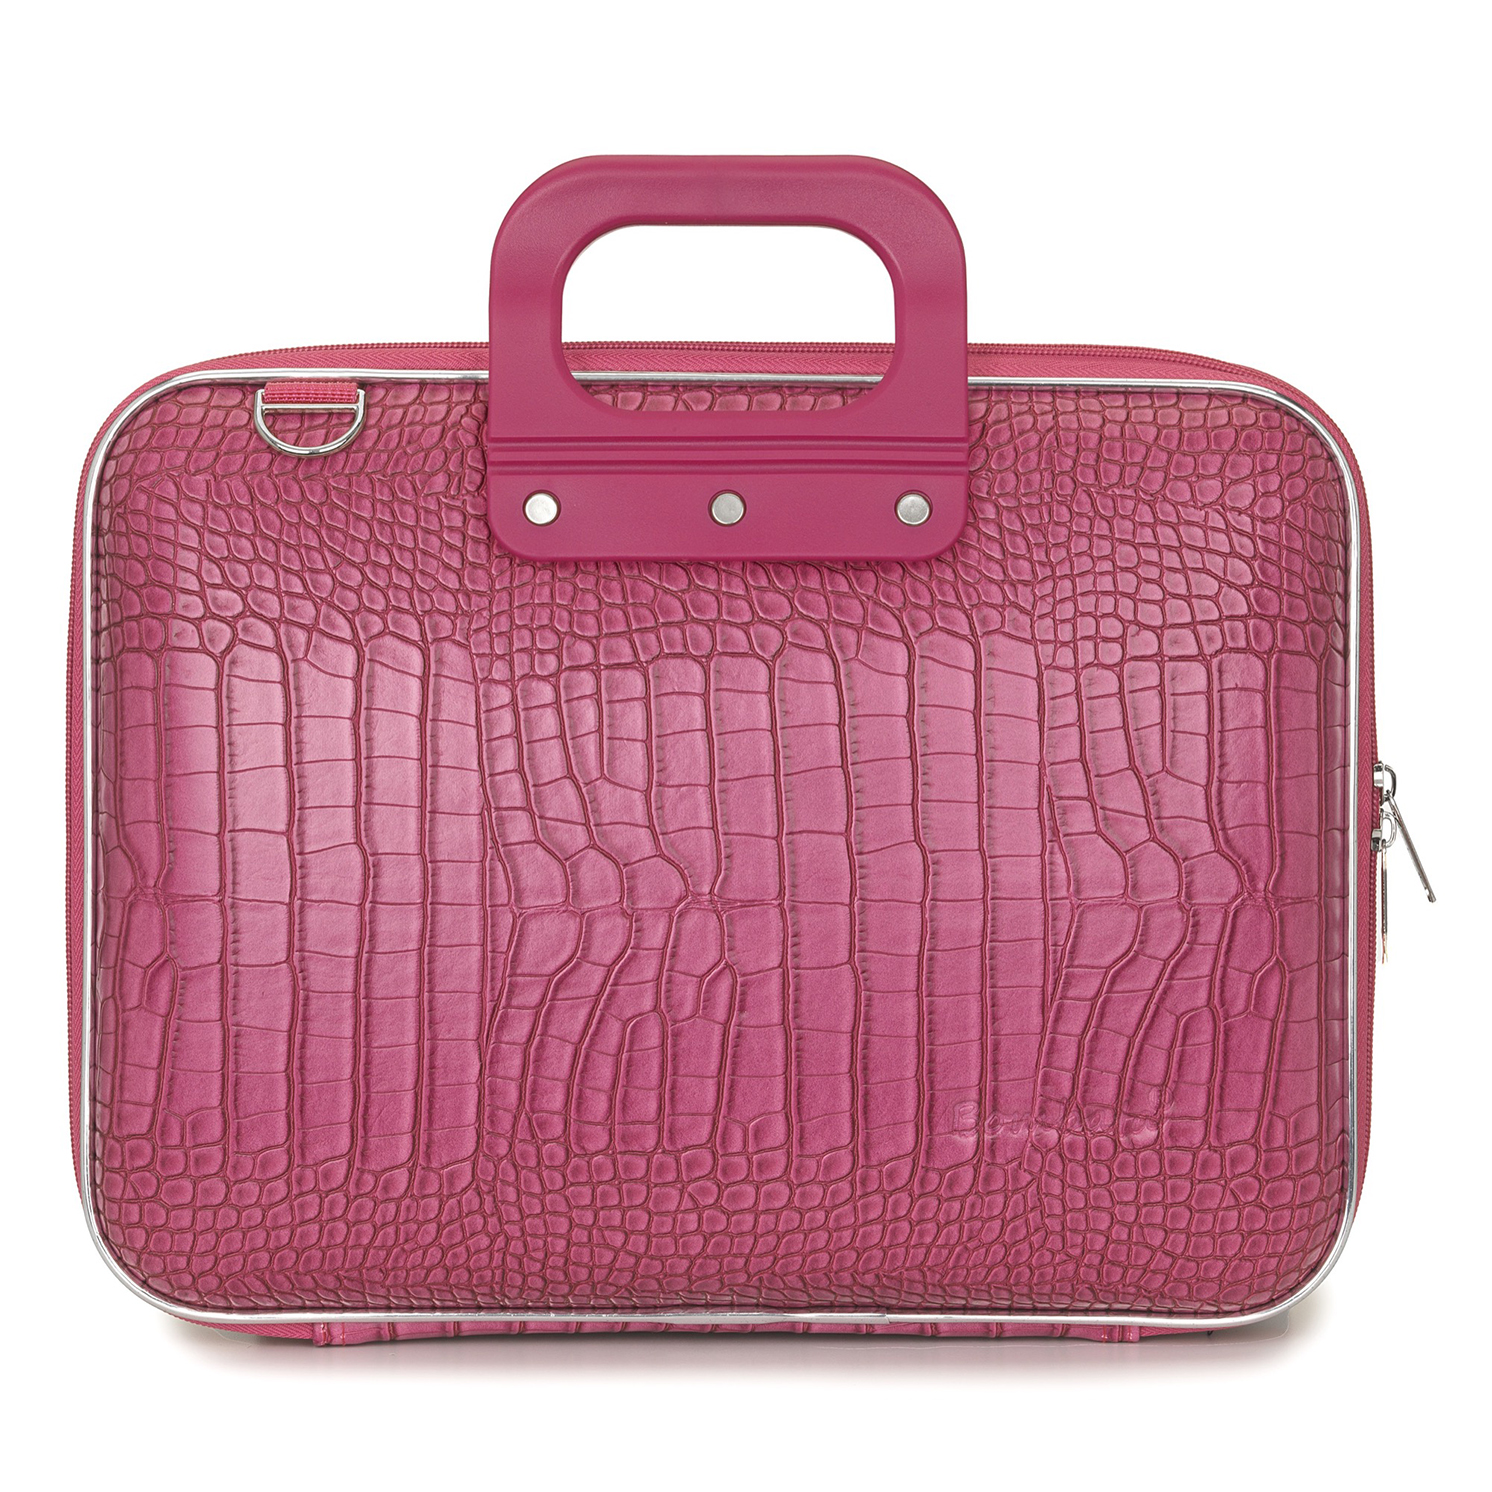 Bombata – Pink Medio Cocco 13″ Laptop Case/Bag with Shoulder Strap